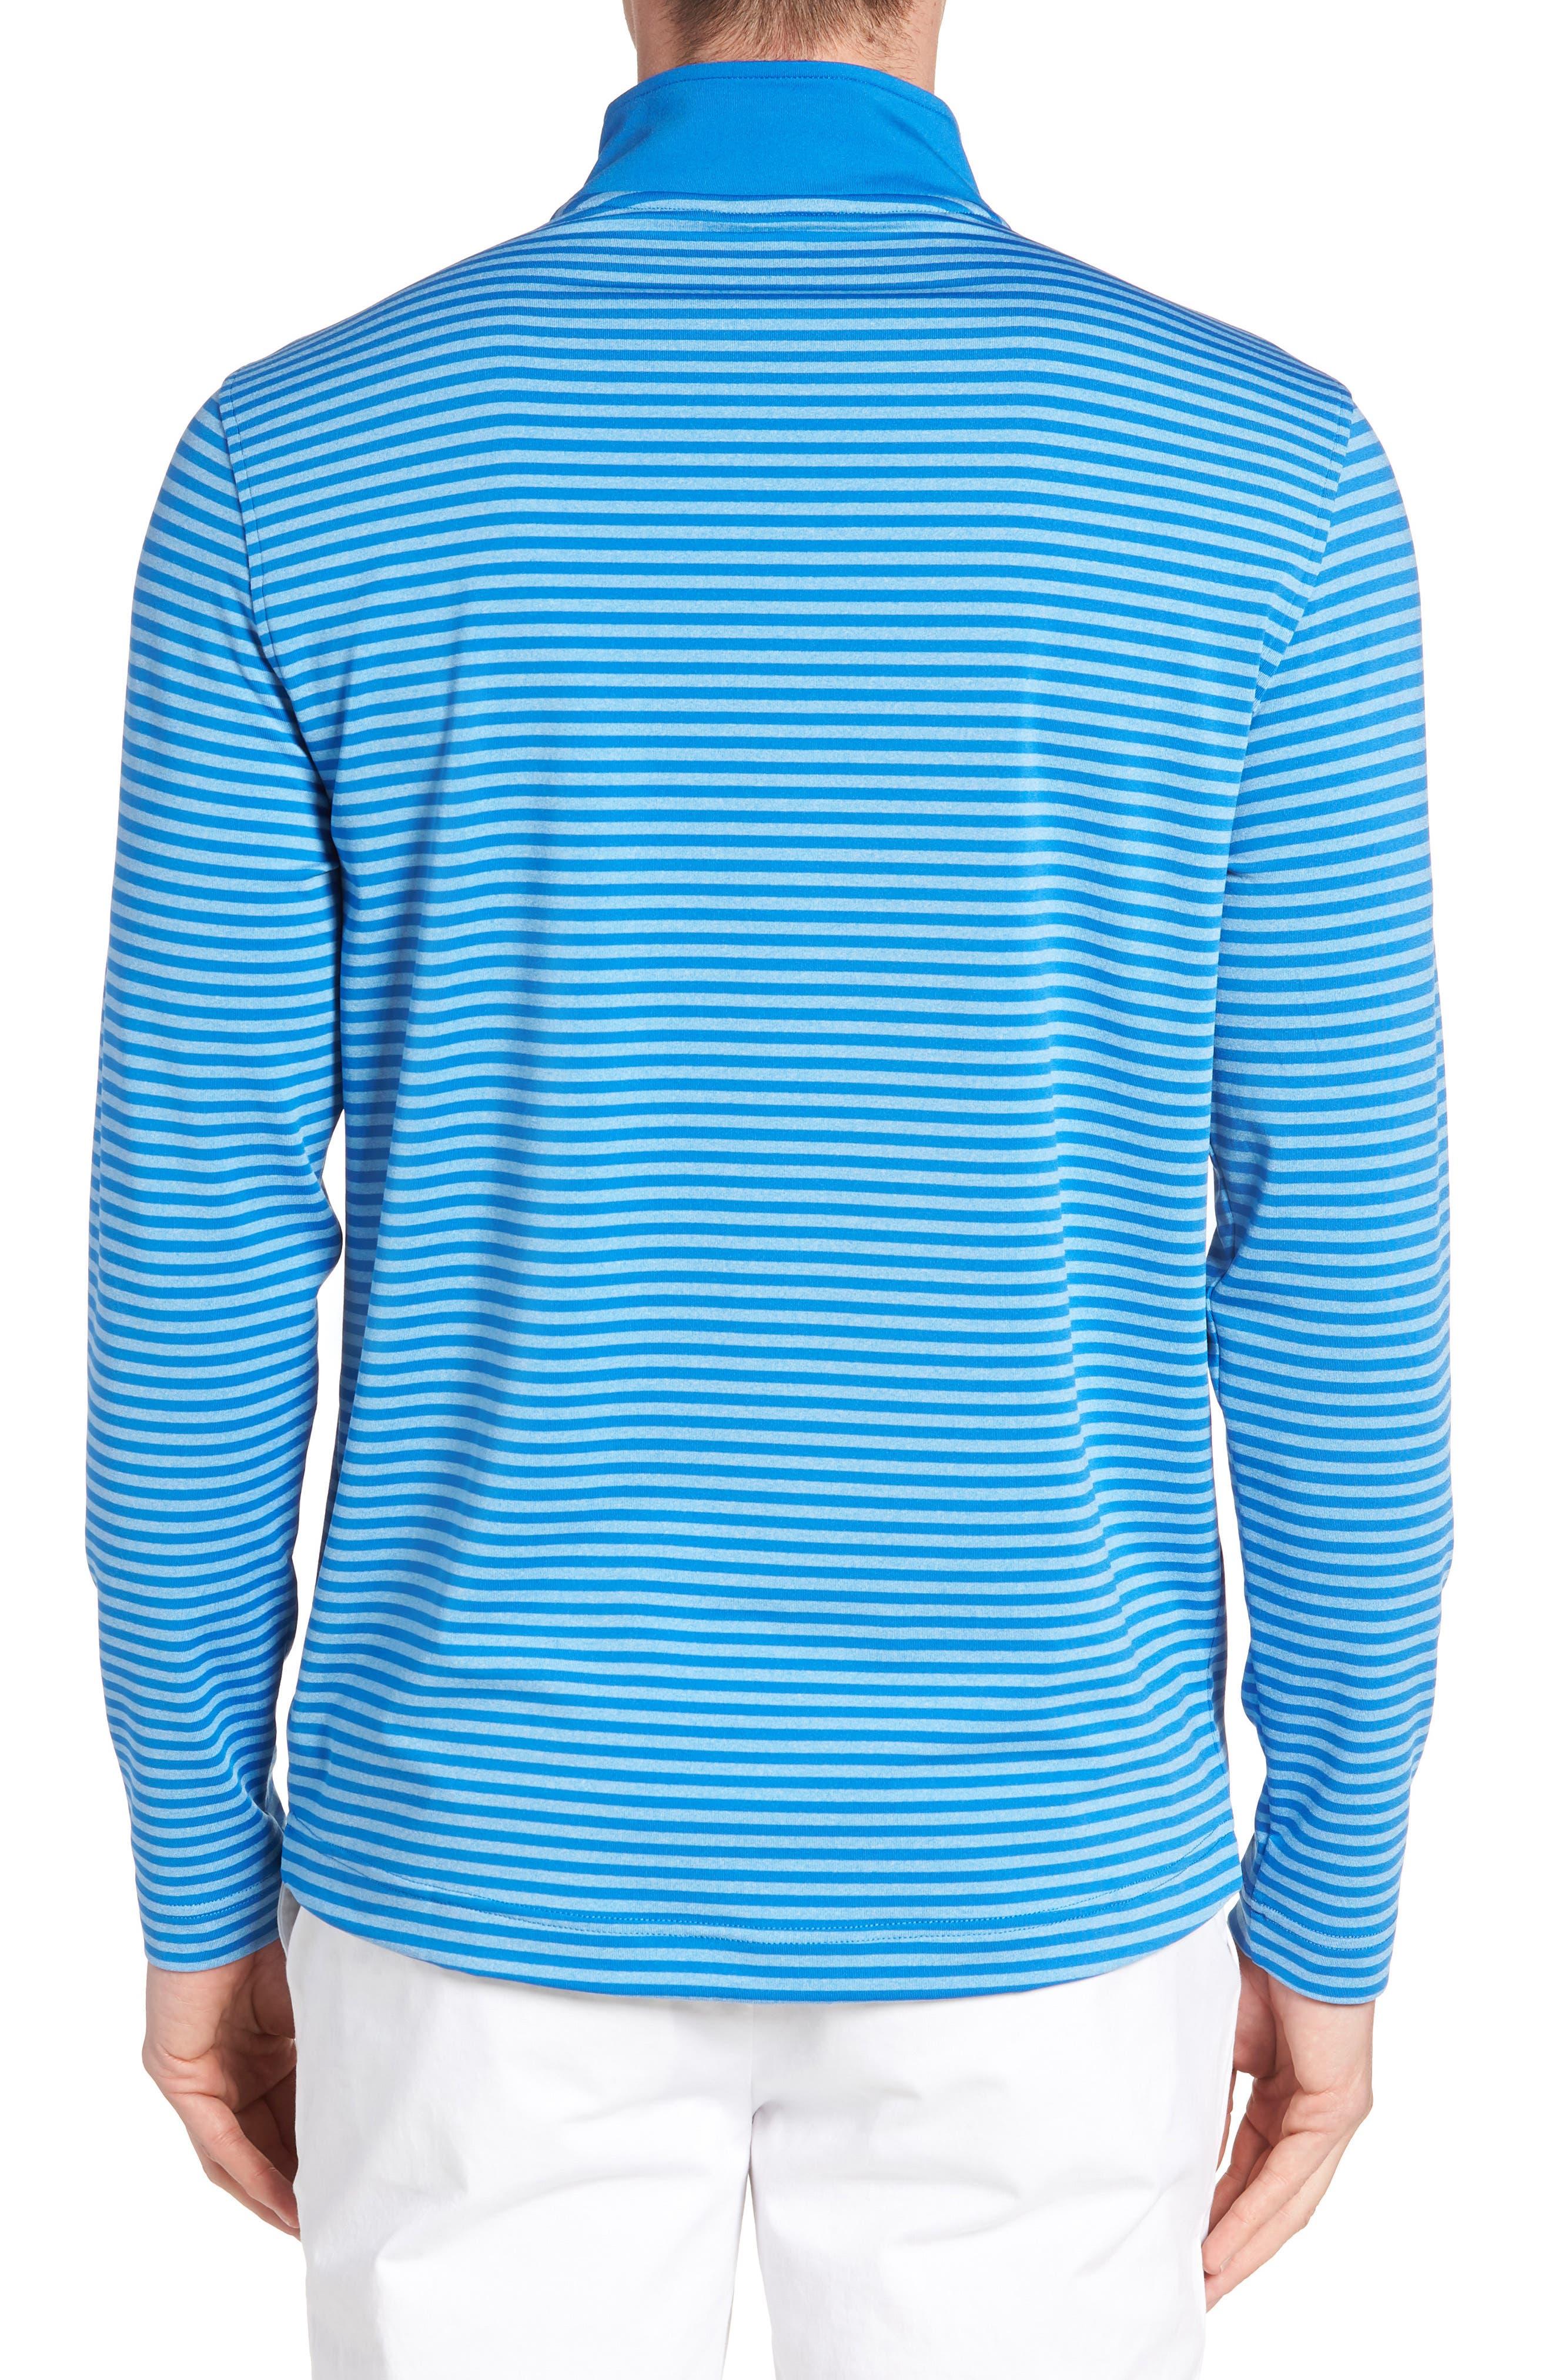 SOUTHERN TIDE,                             Stripe Quarter Zip Pullover,                             Alternate thumbnail 2, color,                             400